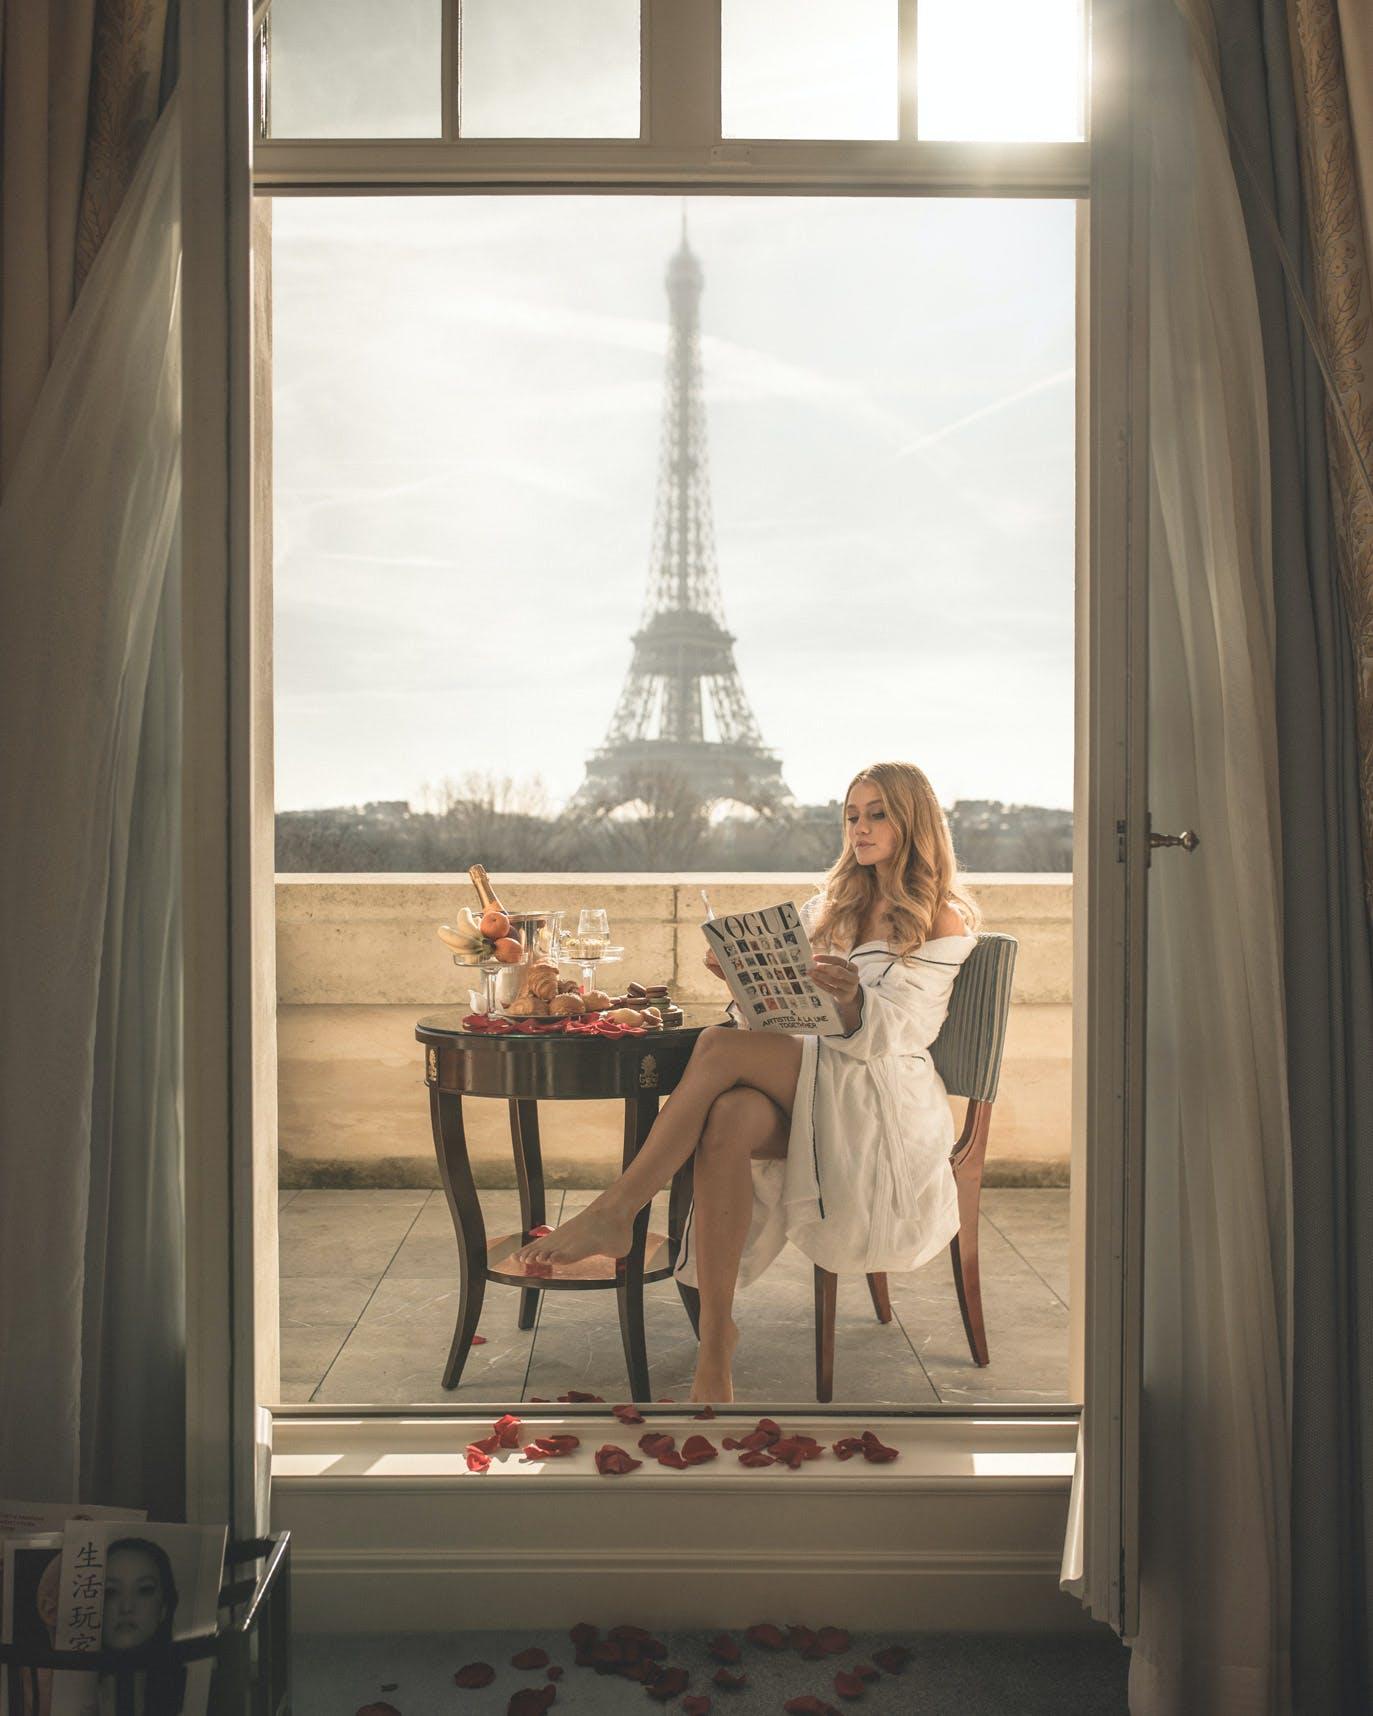 Shangri-La Hotel Eiffel Tower King Bedroom view of the Eiffel Tower